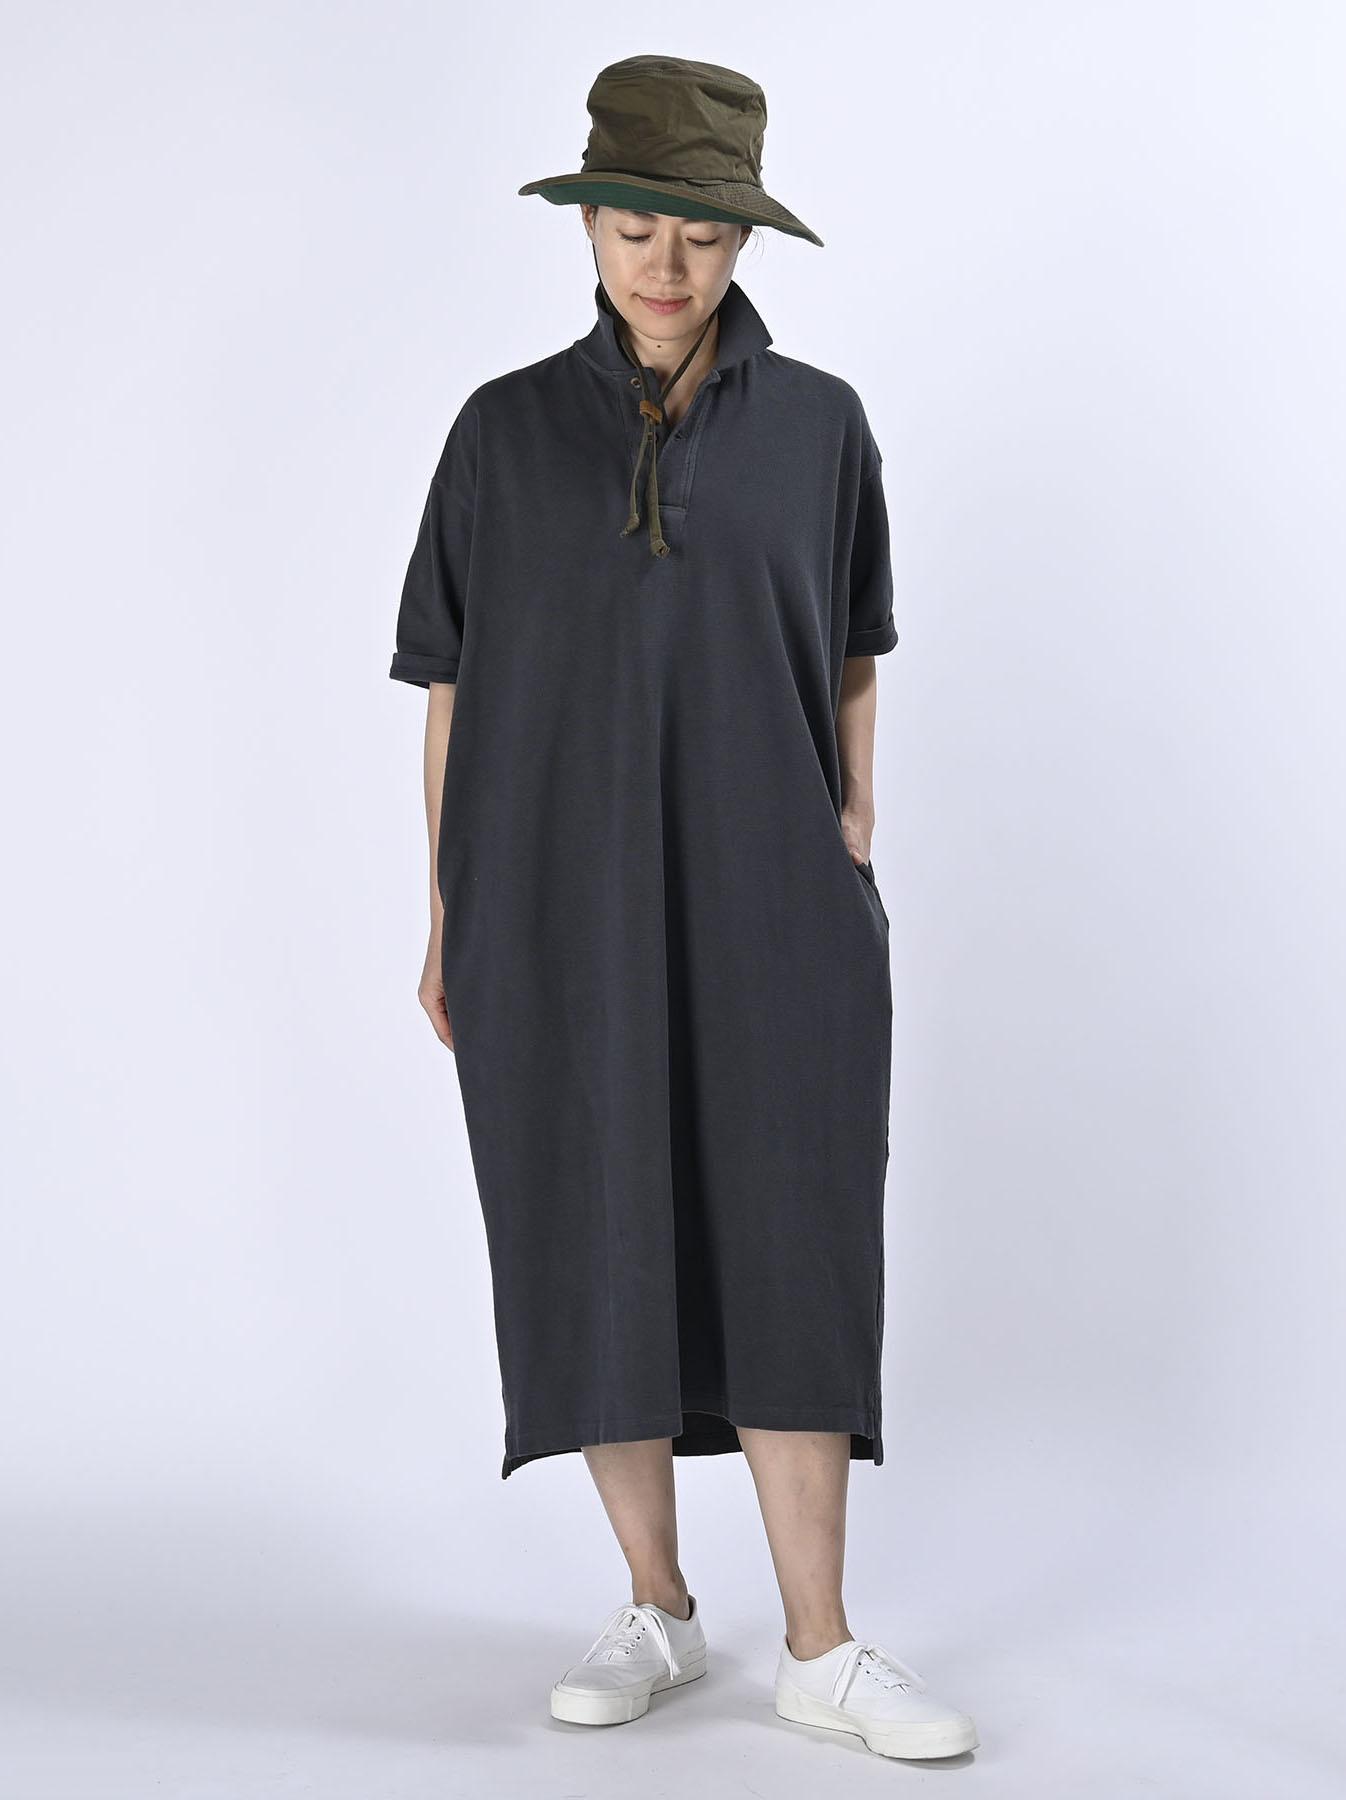 Kanoko Ocean Shiokaze Short-sleeved Polo Dress (0521)-2